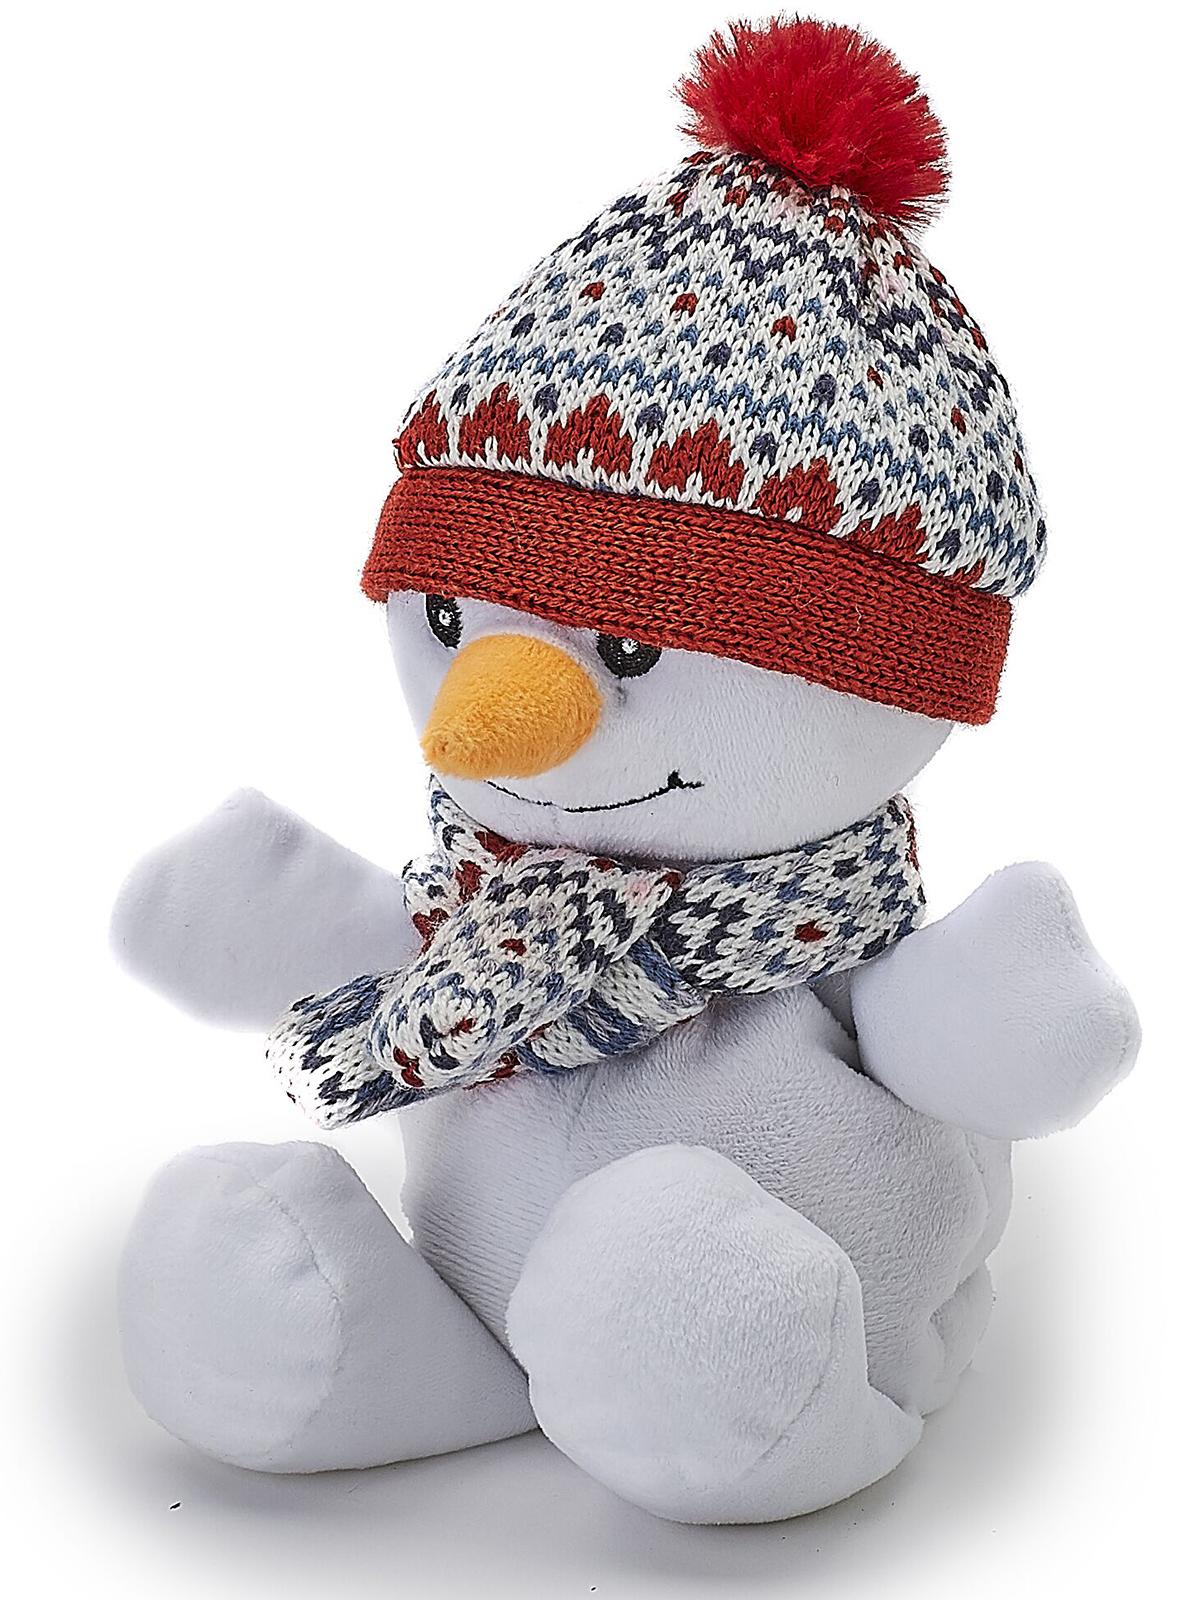 Пинкл (Pinkl) | Игрушка-грелка Junior Снеговичок | Intelex Warmies Cozy Plush Junior Snowman